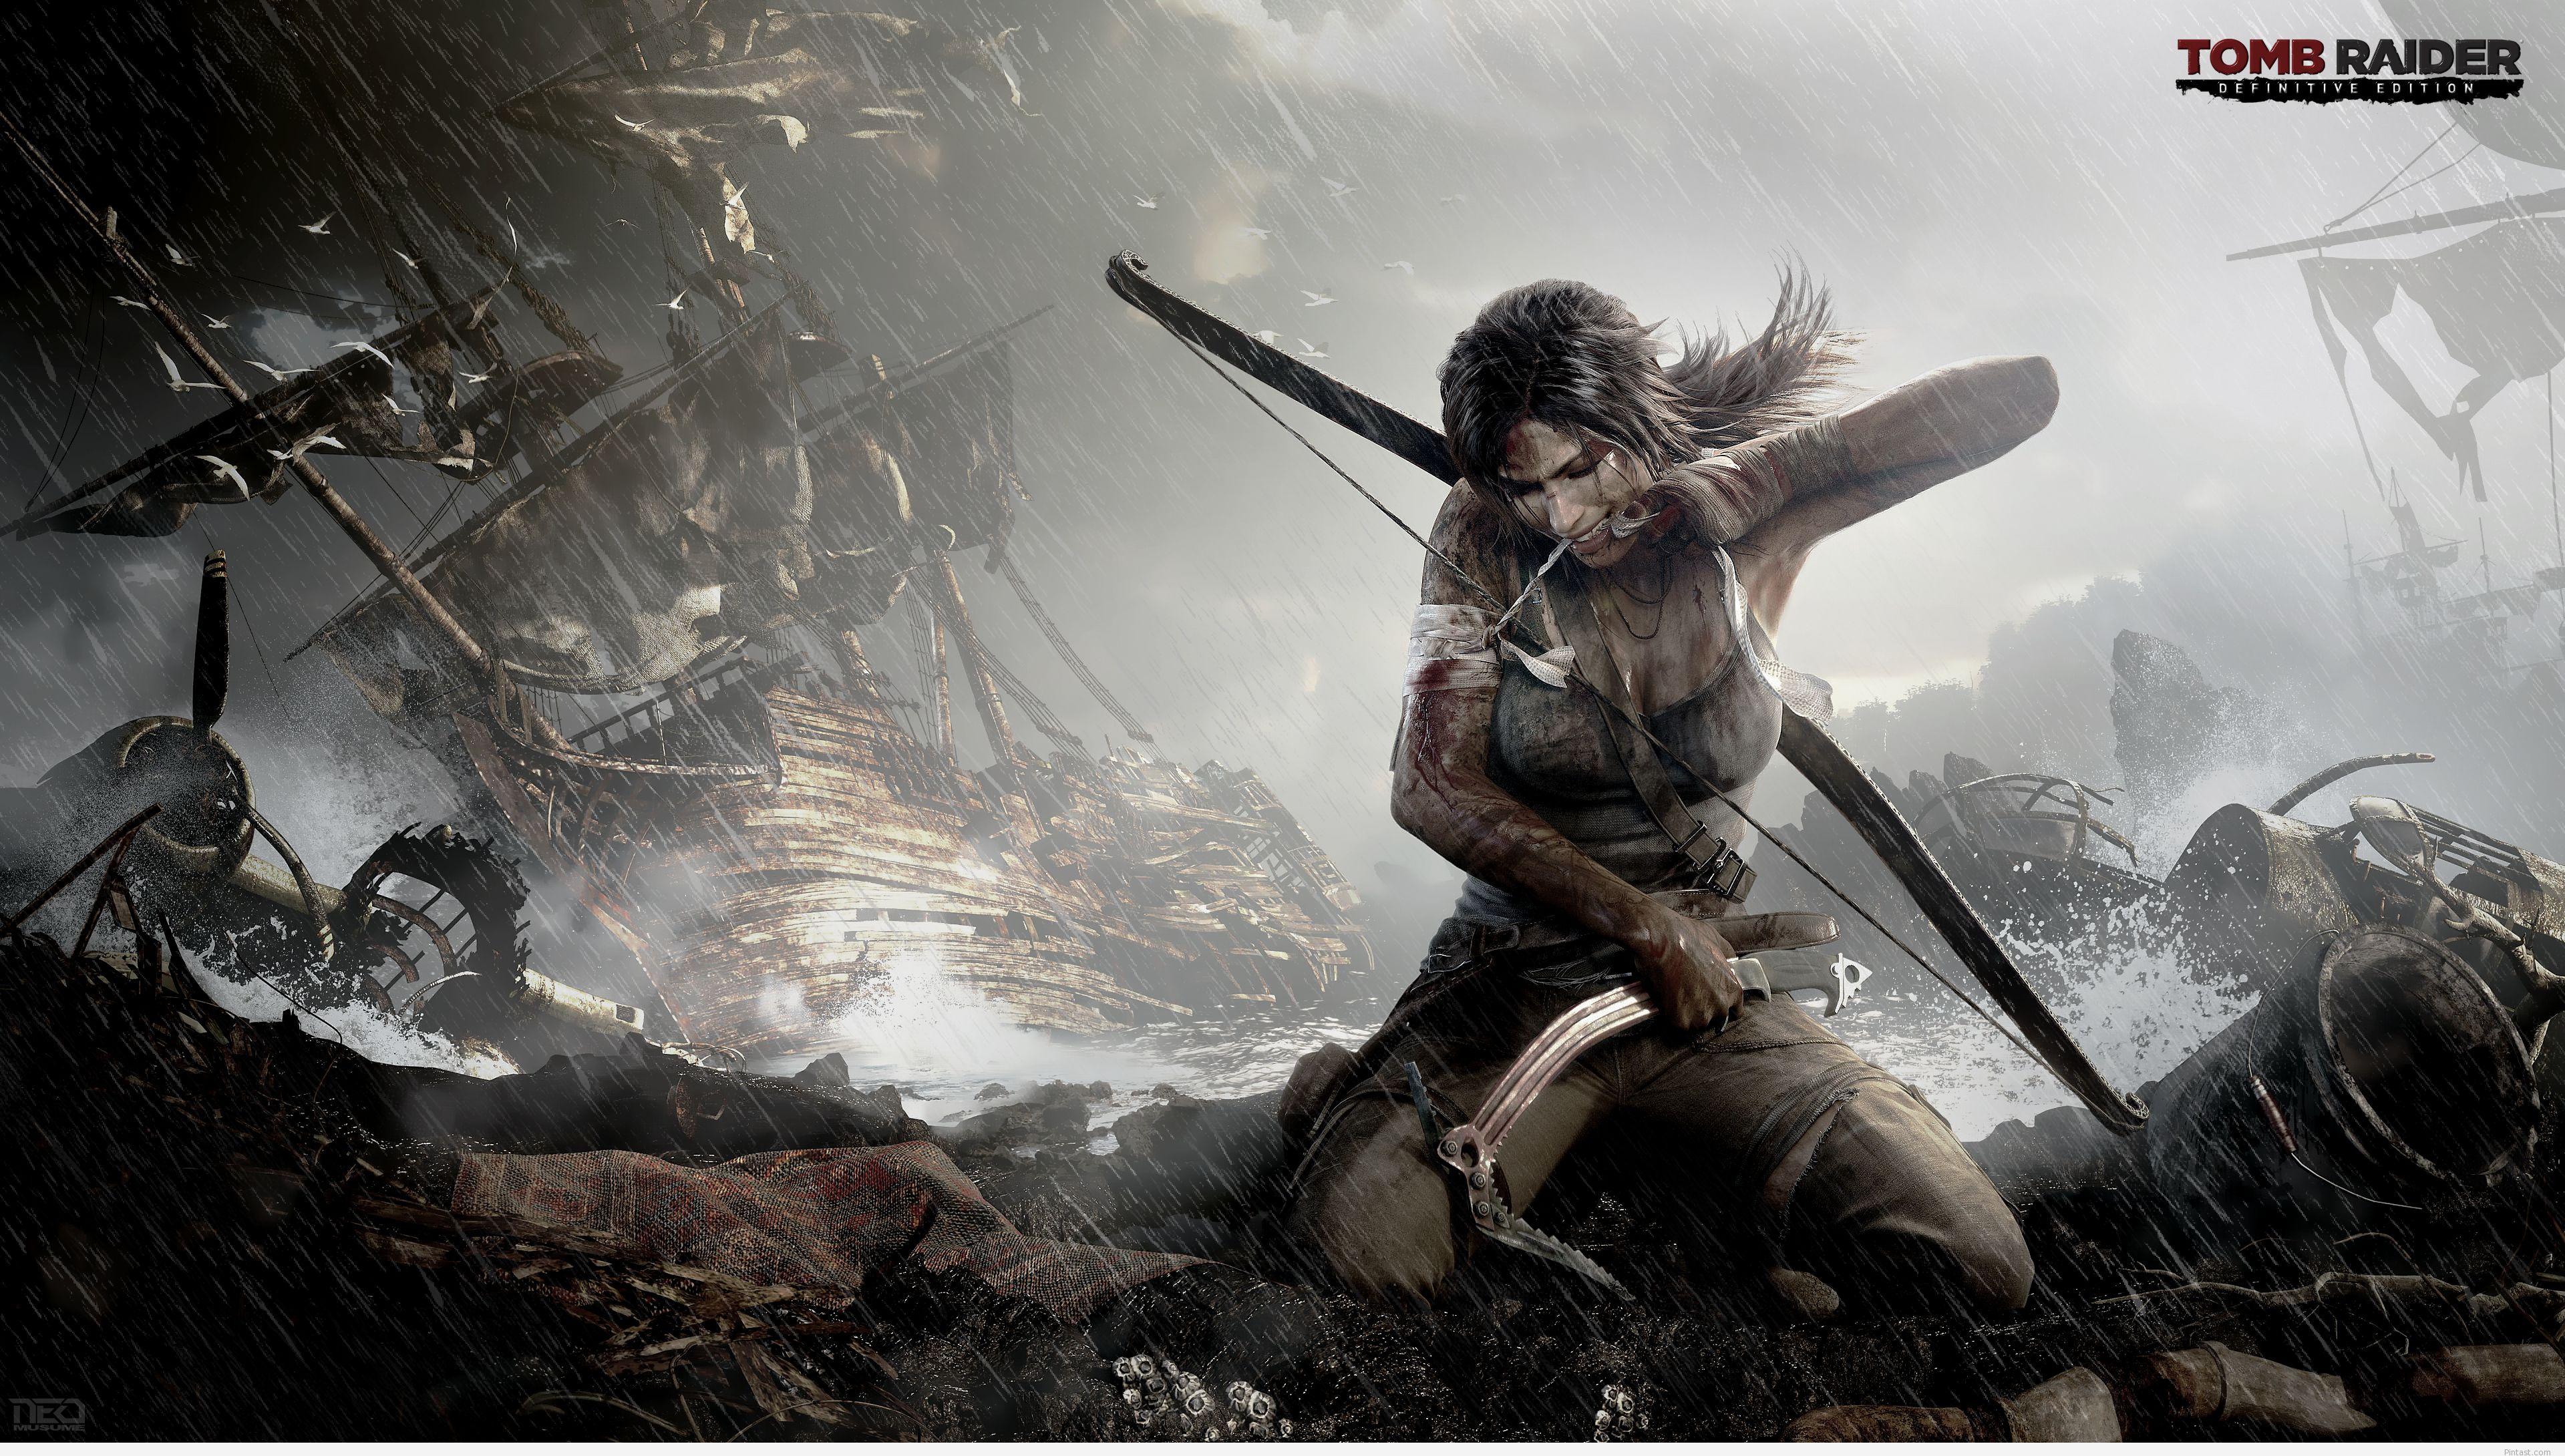 Tomb Raider Definitive Edition 4K High Quality Wallpaper Pintast 3840x2180